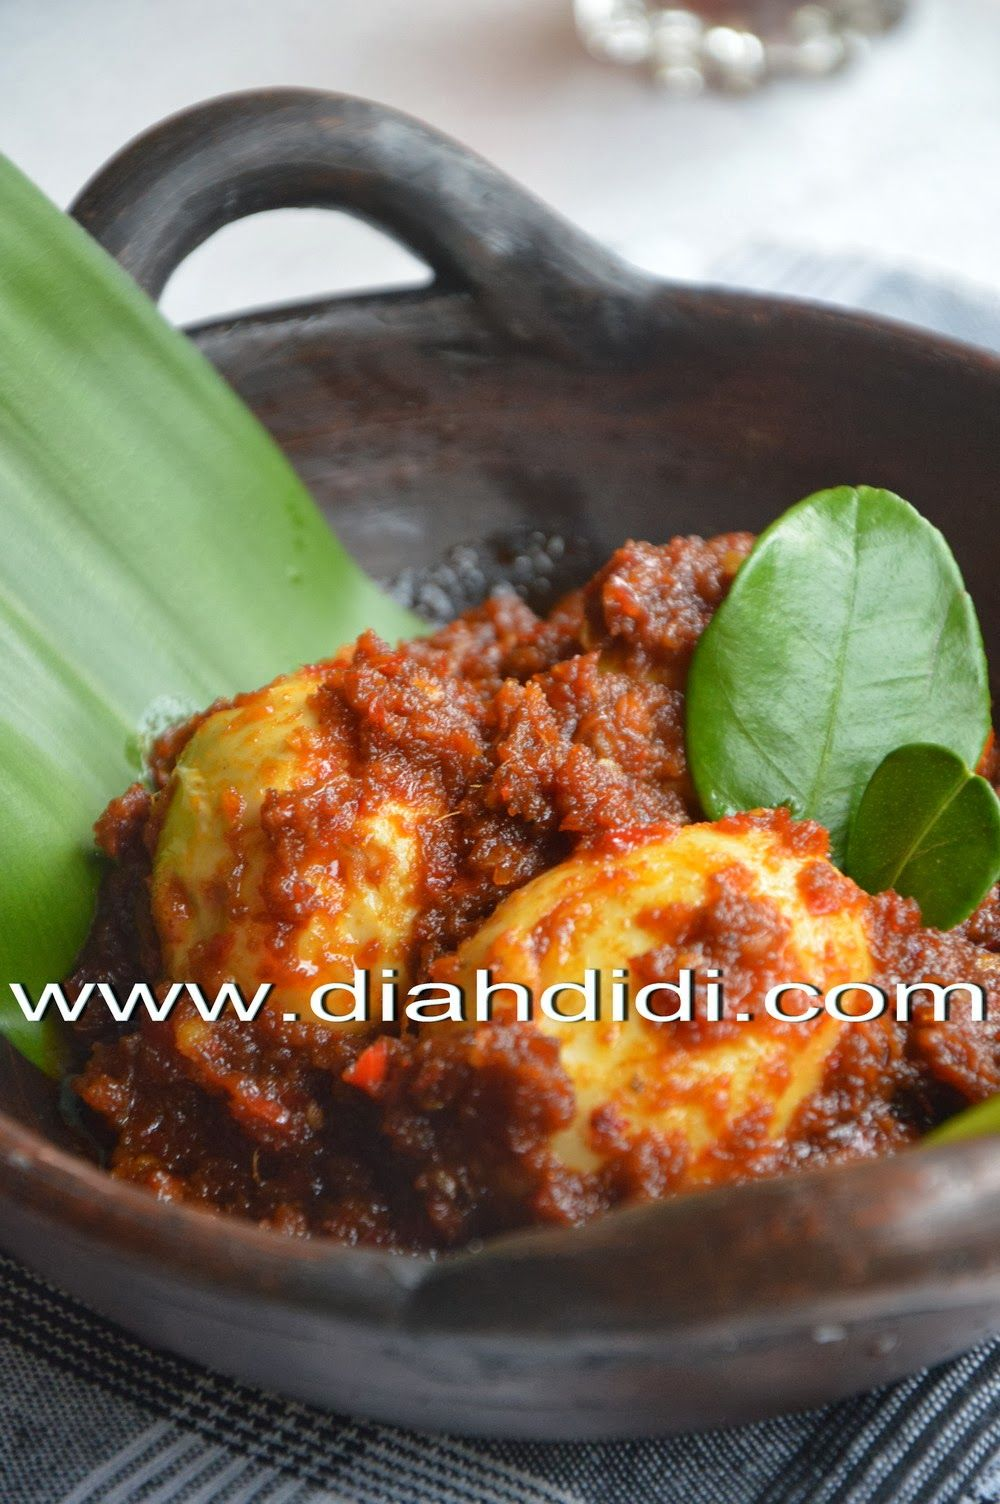 Diah Didi S Kitchen Telur Bumbu Bali Resep Masakan Makan Malam Telur Bumbu